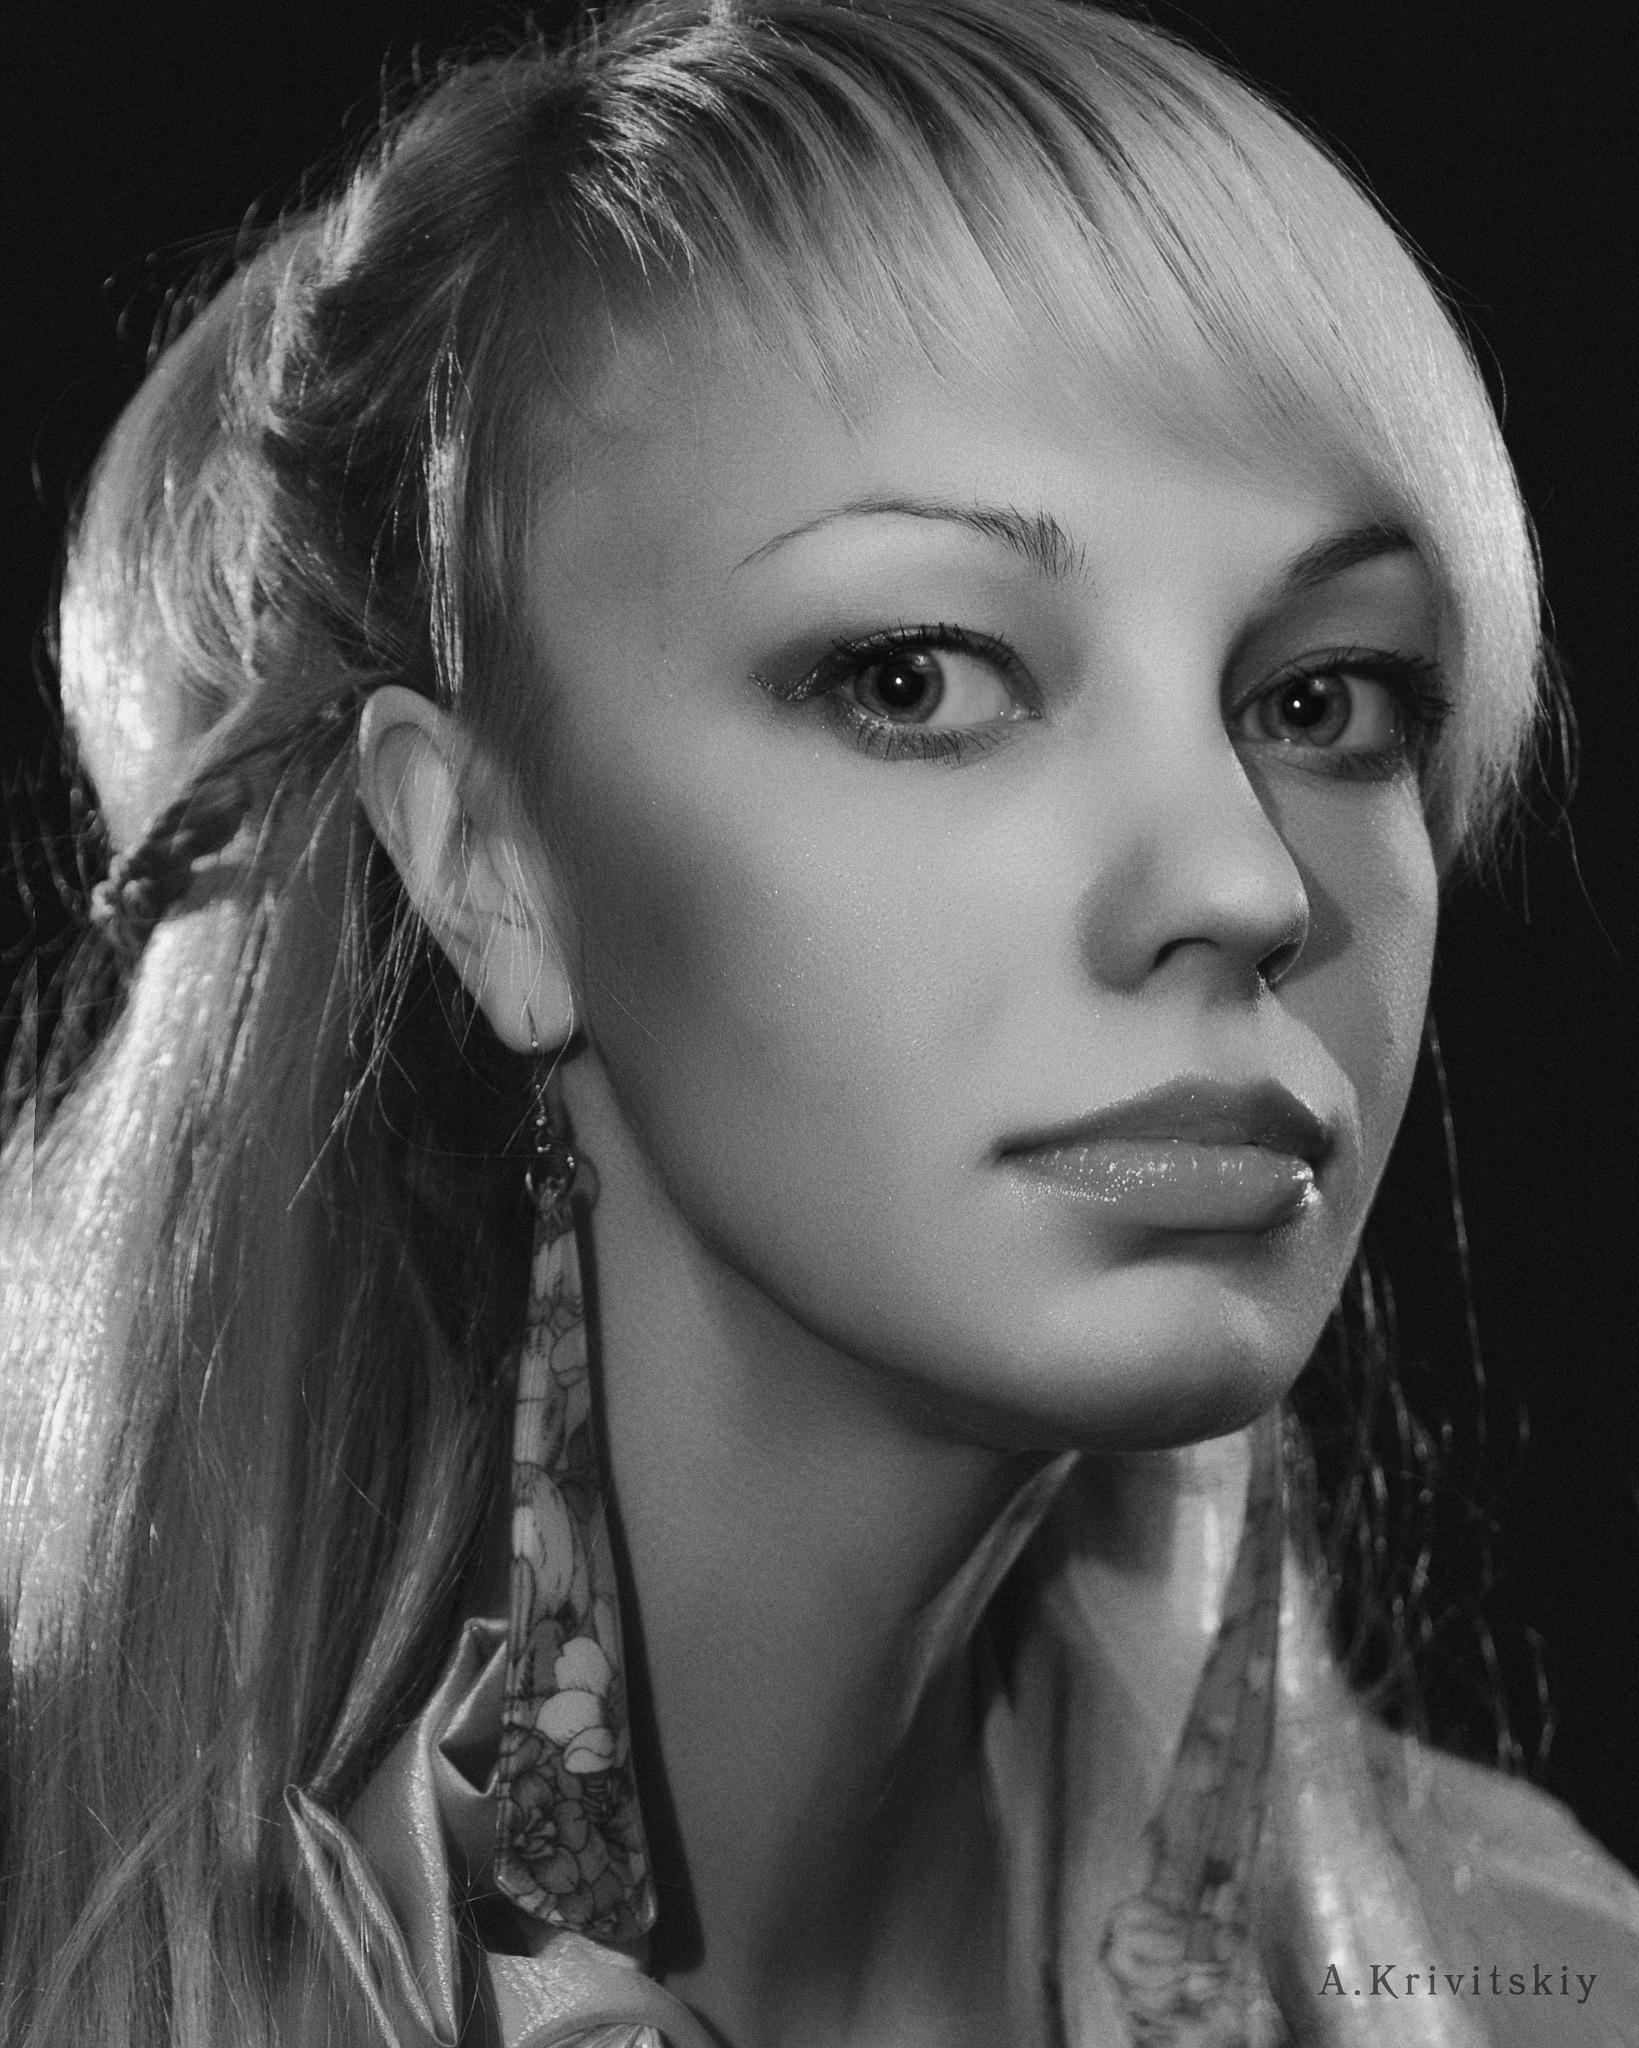 Glamorous Portrait. Photo theater. (Professor A. Krivitsky found that girls like GLAMOR and that GLA by krivitskiy